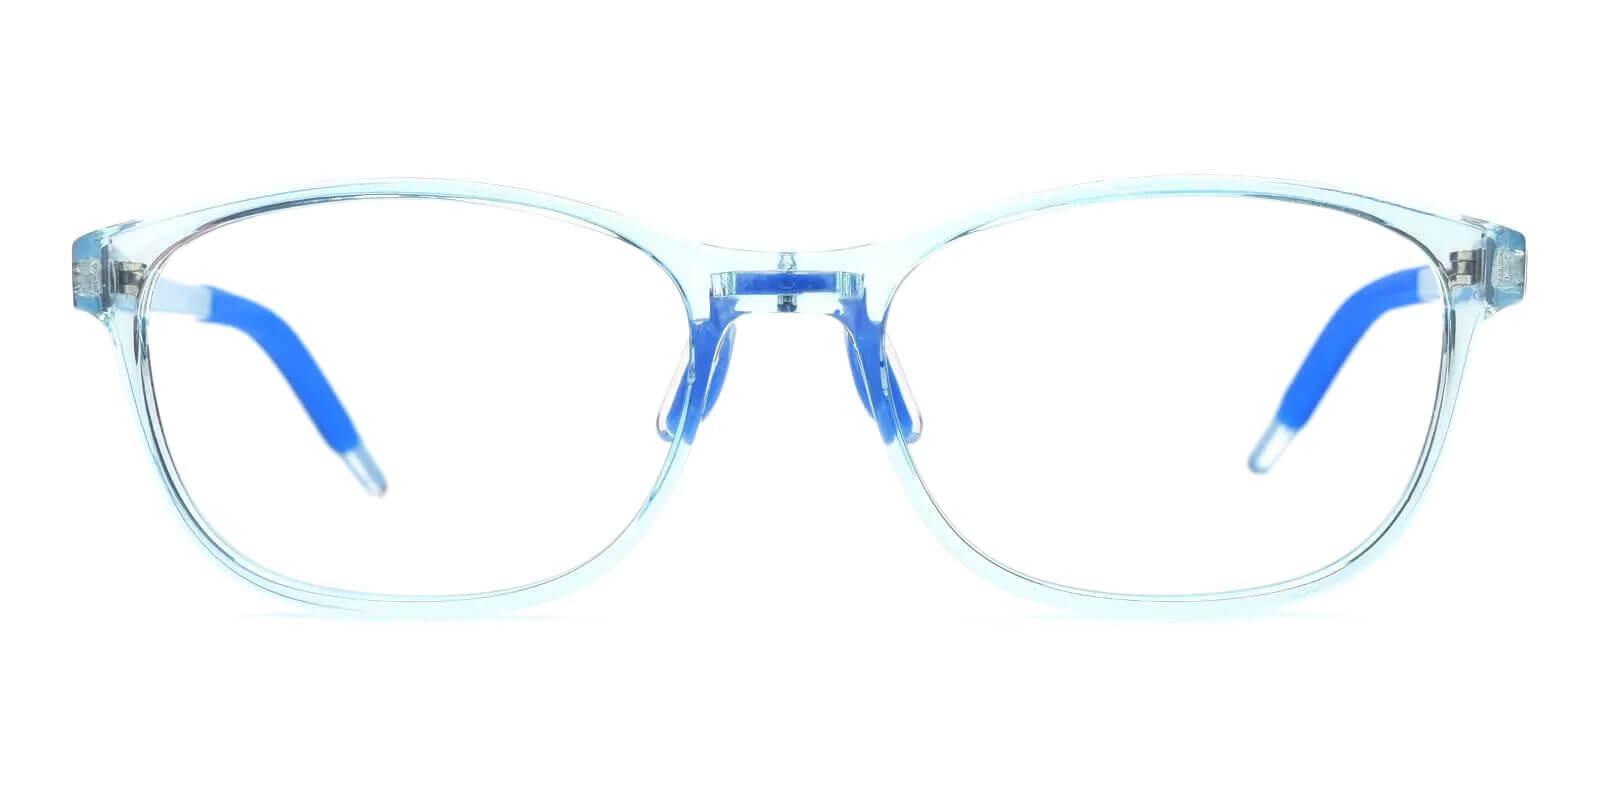 Kids-Dione Blue TR Eyeglasses , Lightweight , UniversalBridgeFit Frames from ABBE Glasses